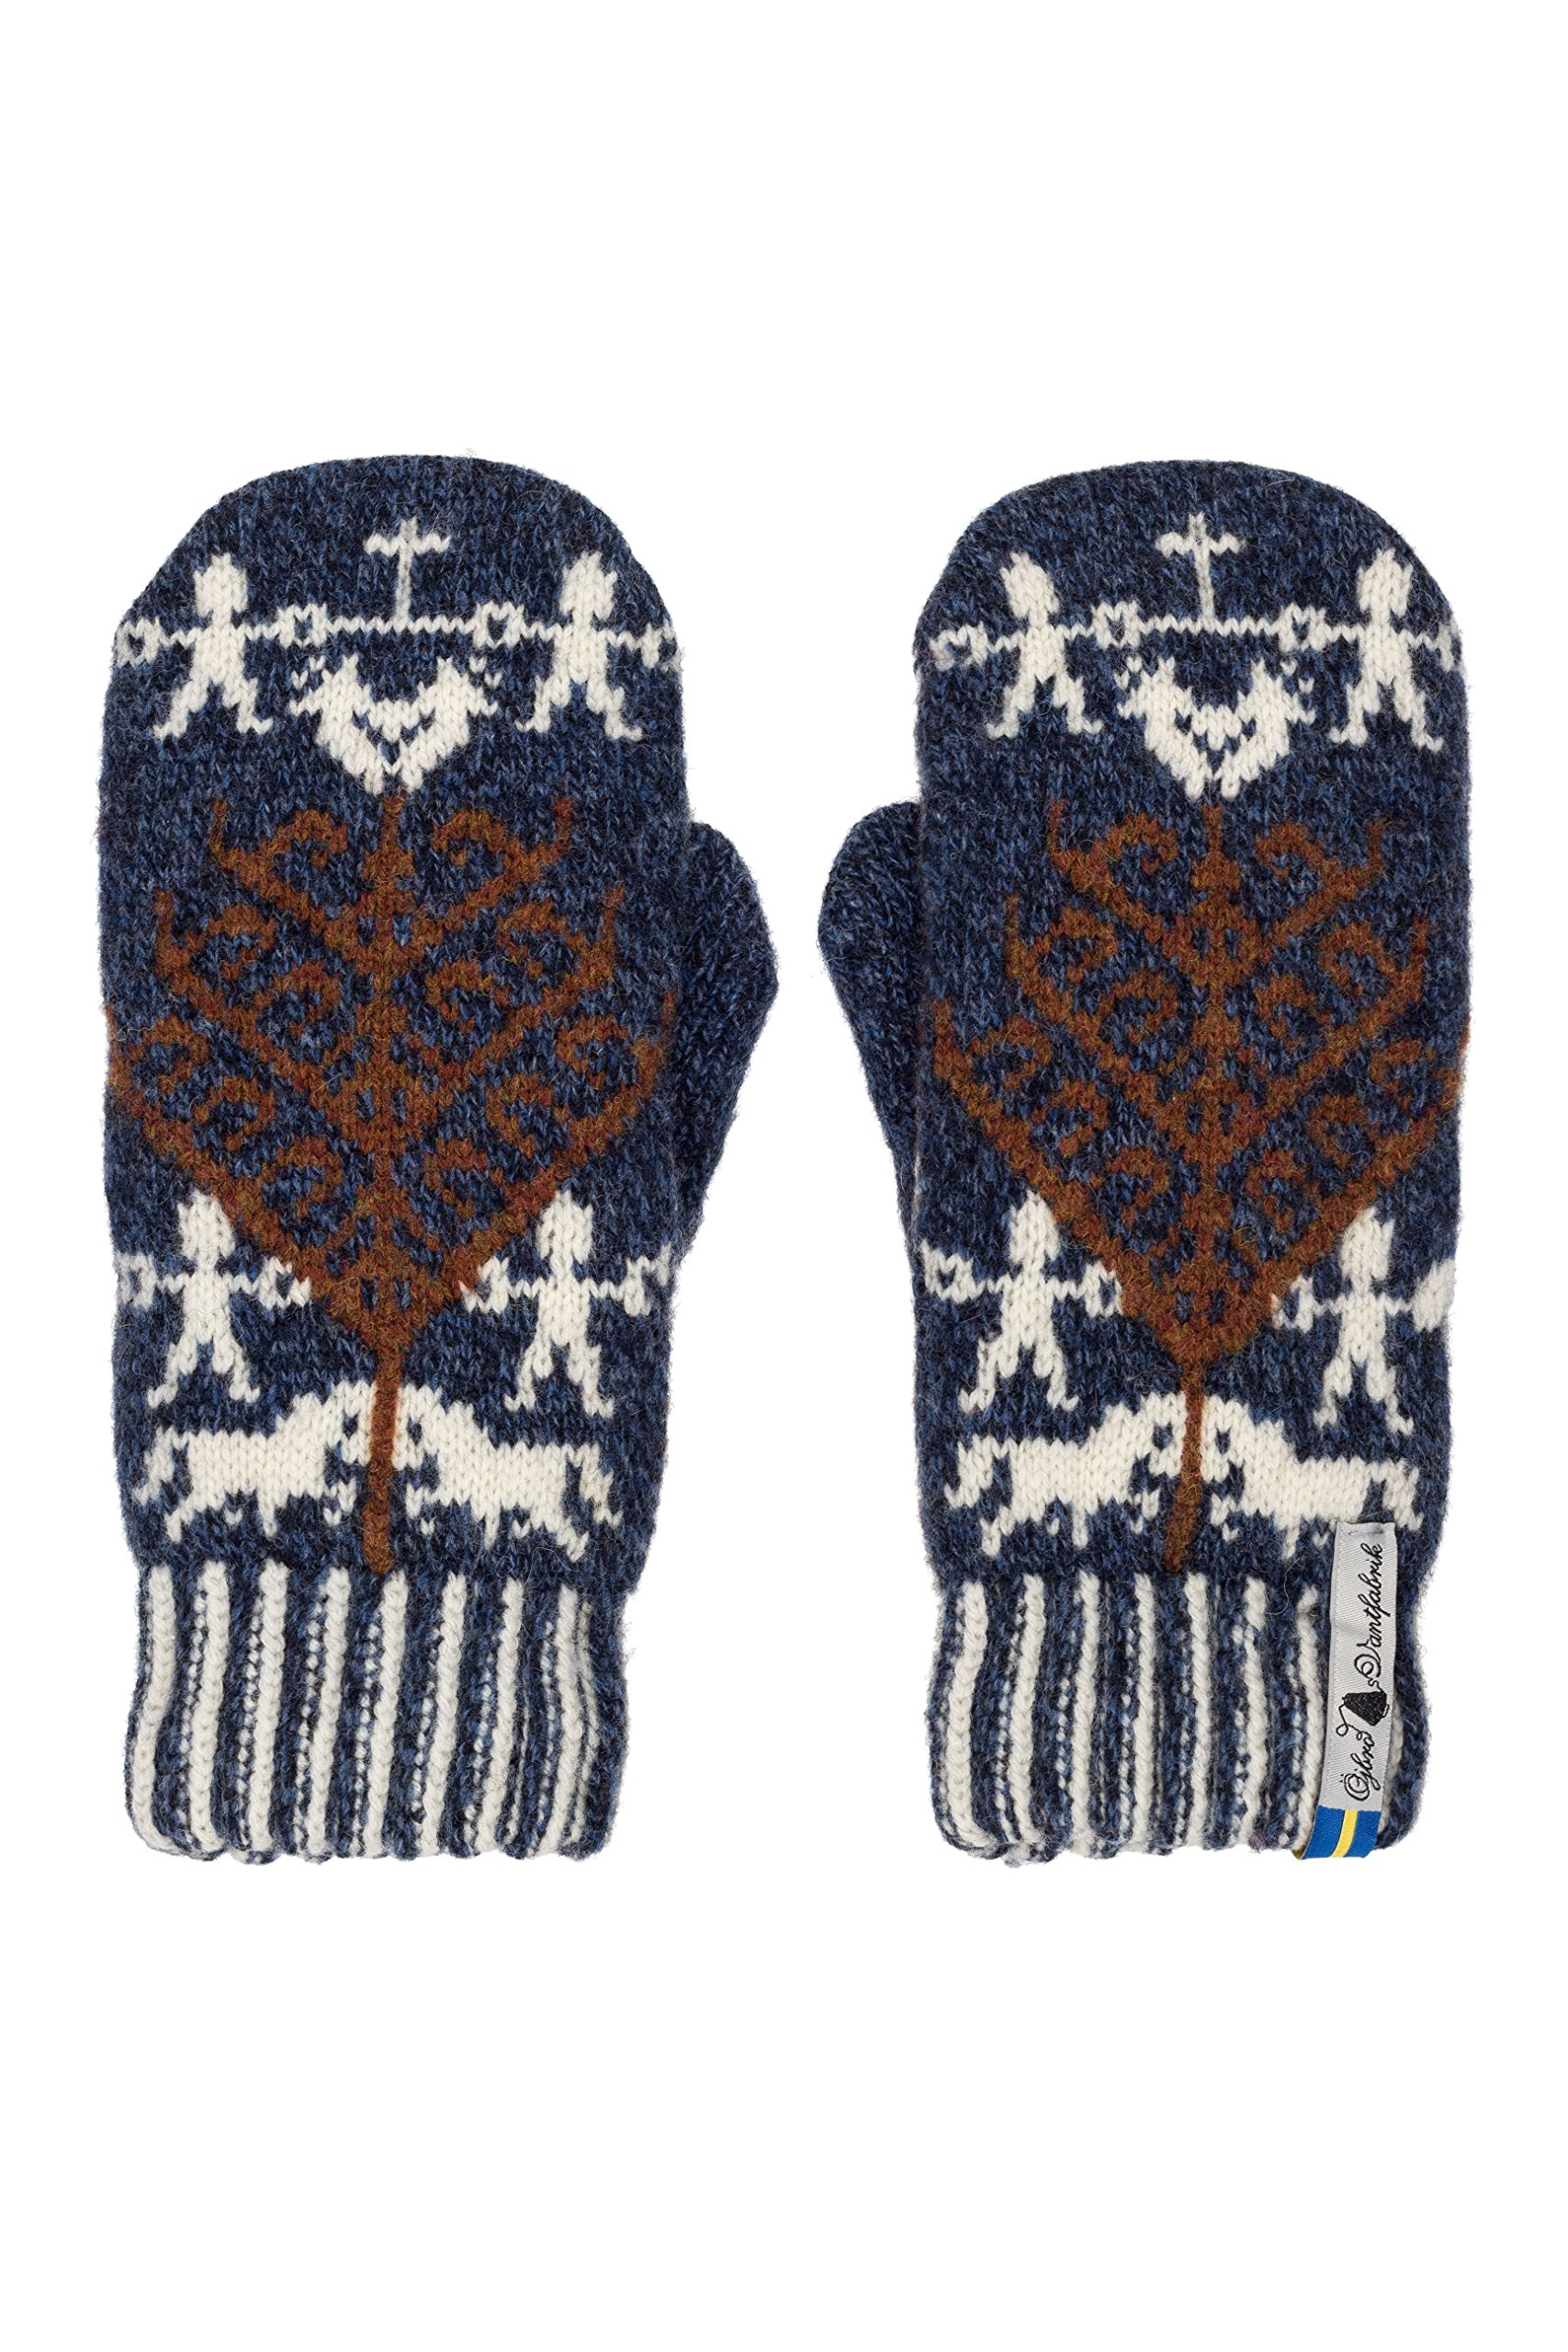 Öjbro Swedish made 100% Merino Wool Soft Thick & Extremely Warm Mittens (Small, Yggdrasil Livtrånad) (Small, Yggdrasil Livtrånad)